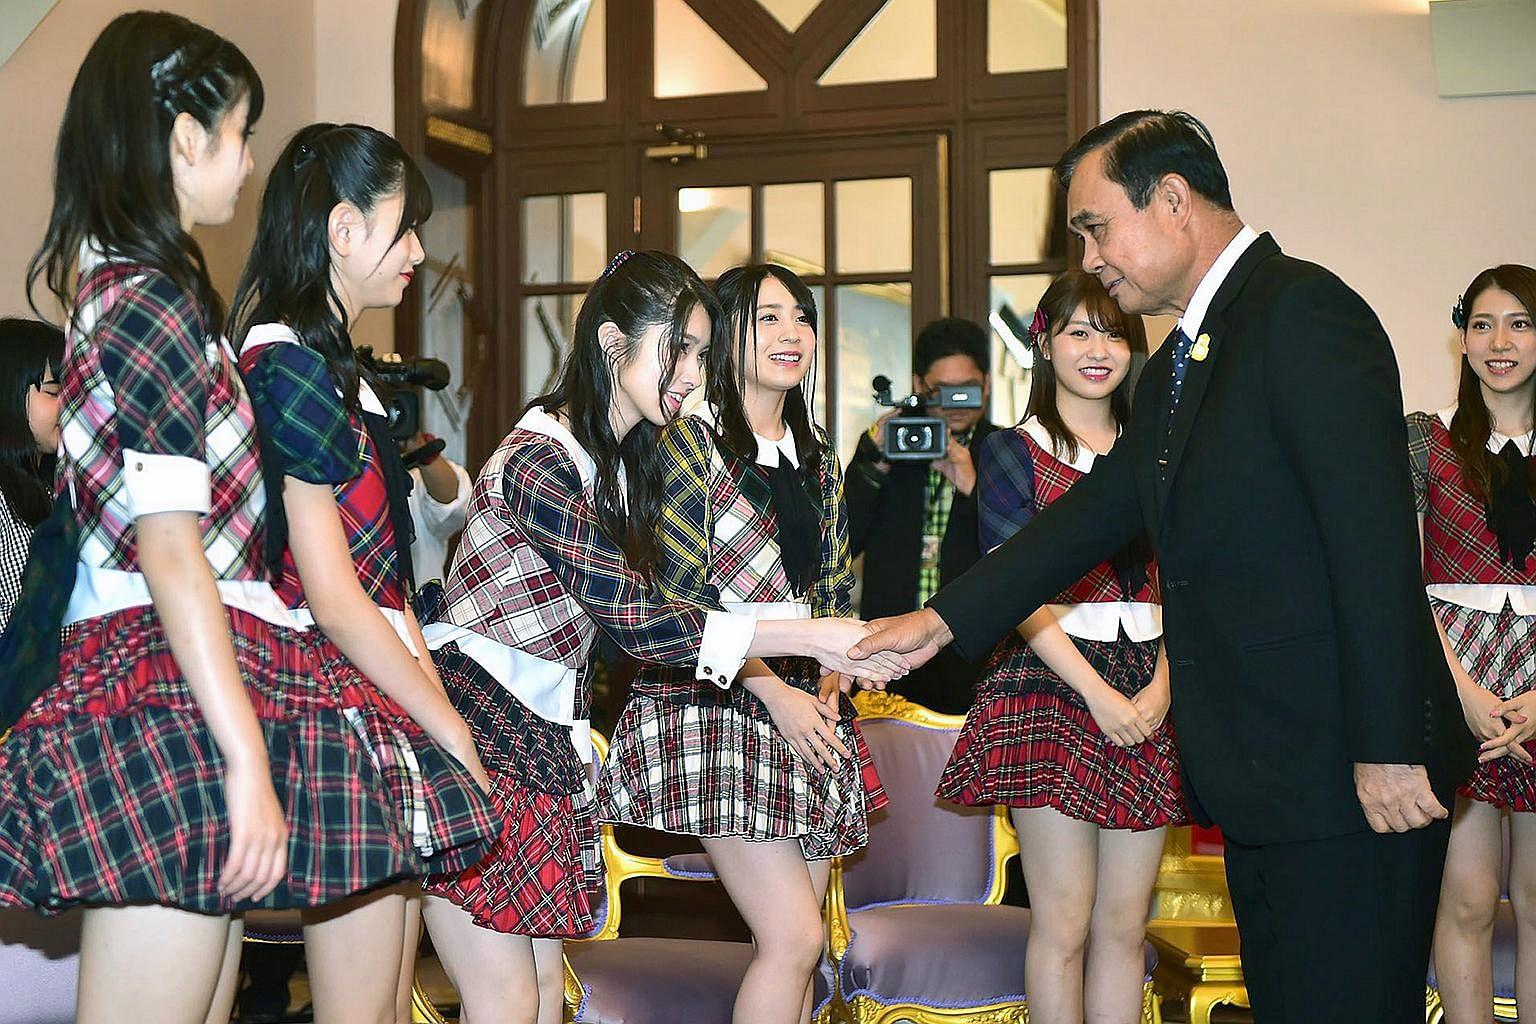 Thai PM Prayut hosts J-pop girl group AKB48, in move seen as